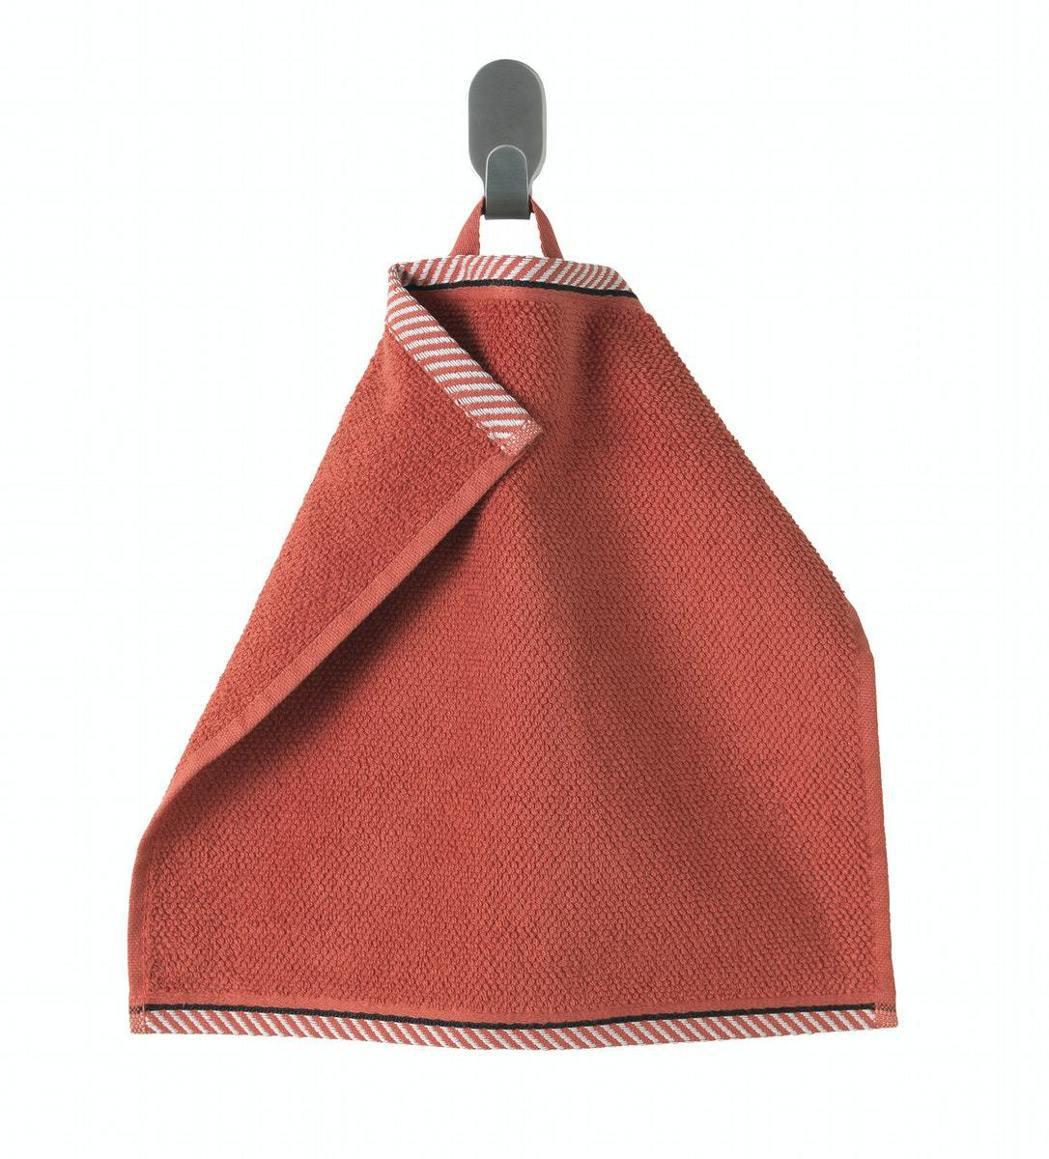 VIKFJÄRD毛巾原價39元,特價9元。圖/IKEA提供